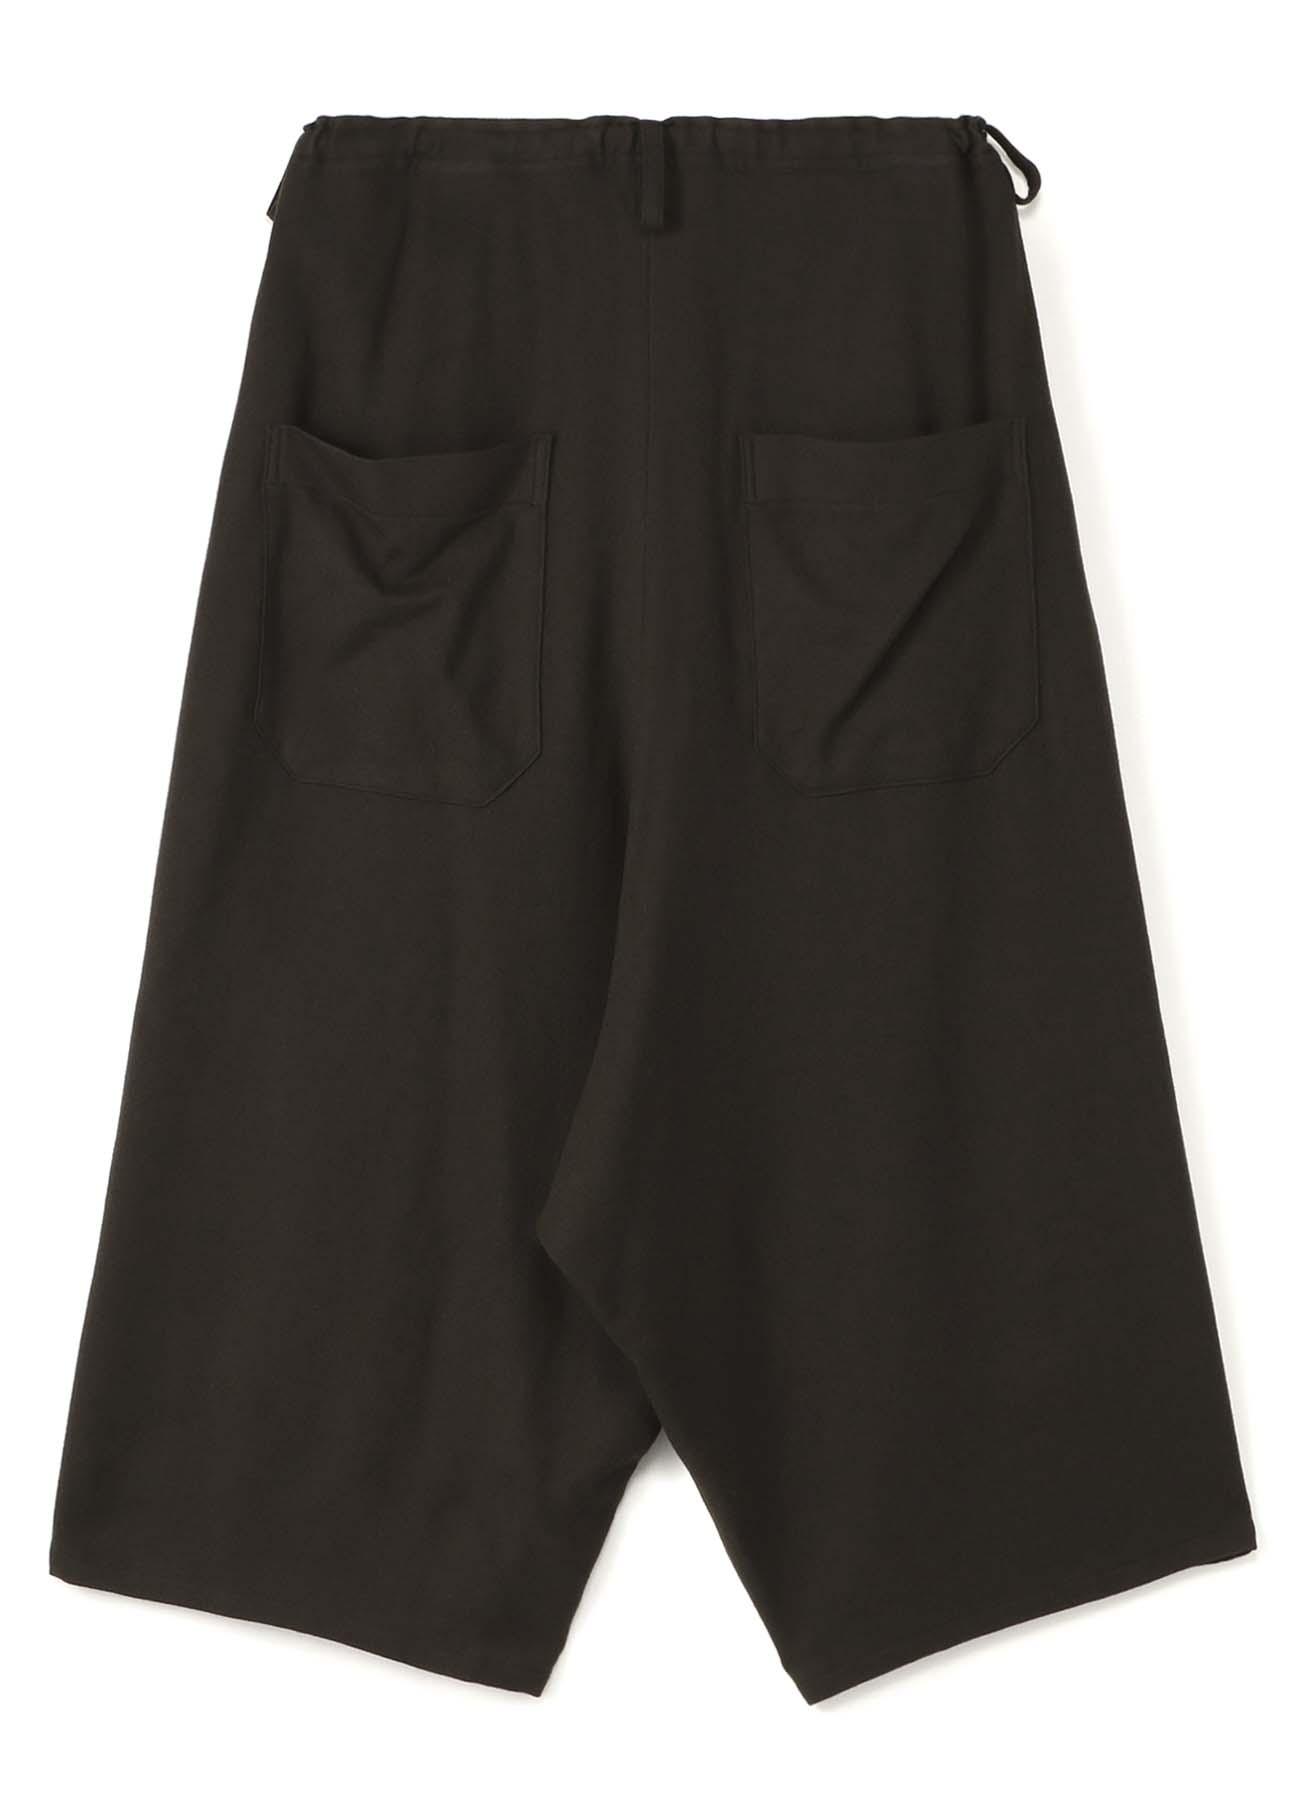 SUPER120 SOFT VIYELLA BIG THICK PANTS